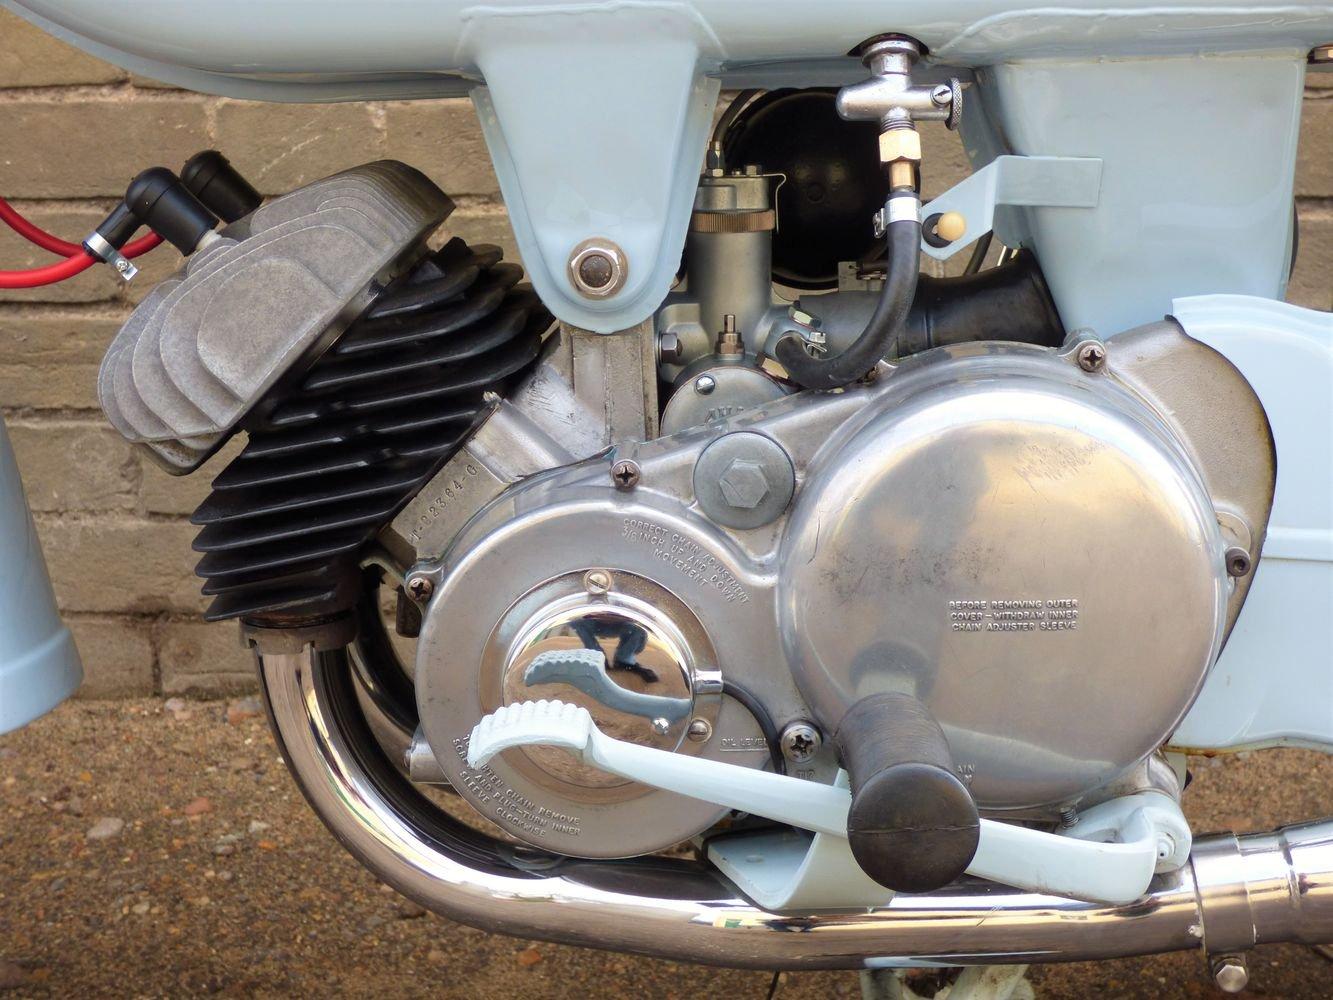 1961 Ariel 'Golden' Arrow Super Sports 250cc SOLD (picture 3 of 6)